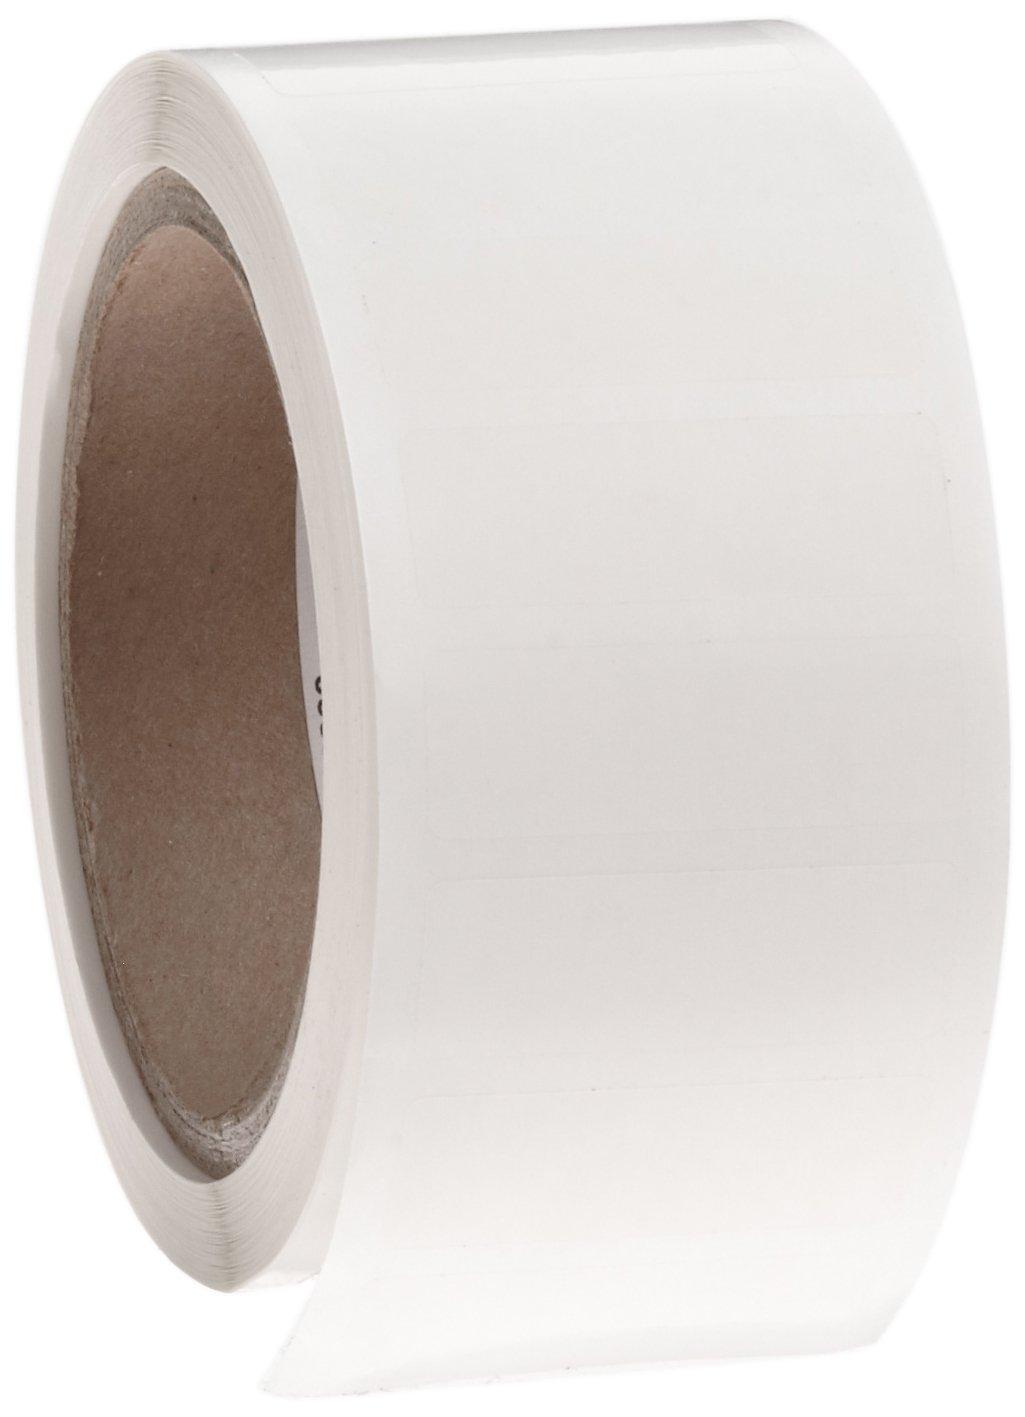 Brady THTOL-172-966B-1 1.77 Width x 0.59 Height B-966B Polyester Overlaminate Gloss Finish Clear Raised Panel Label 1000 per Roll Brady Worldwide Inc.